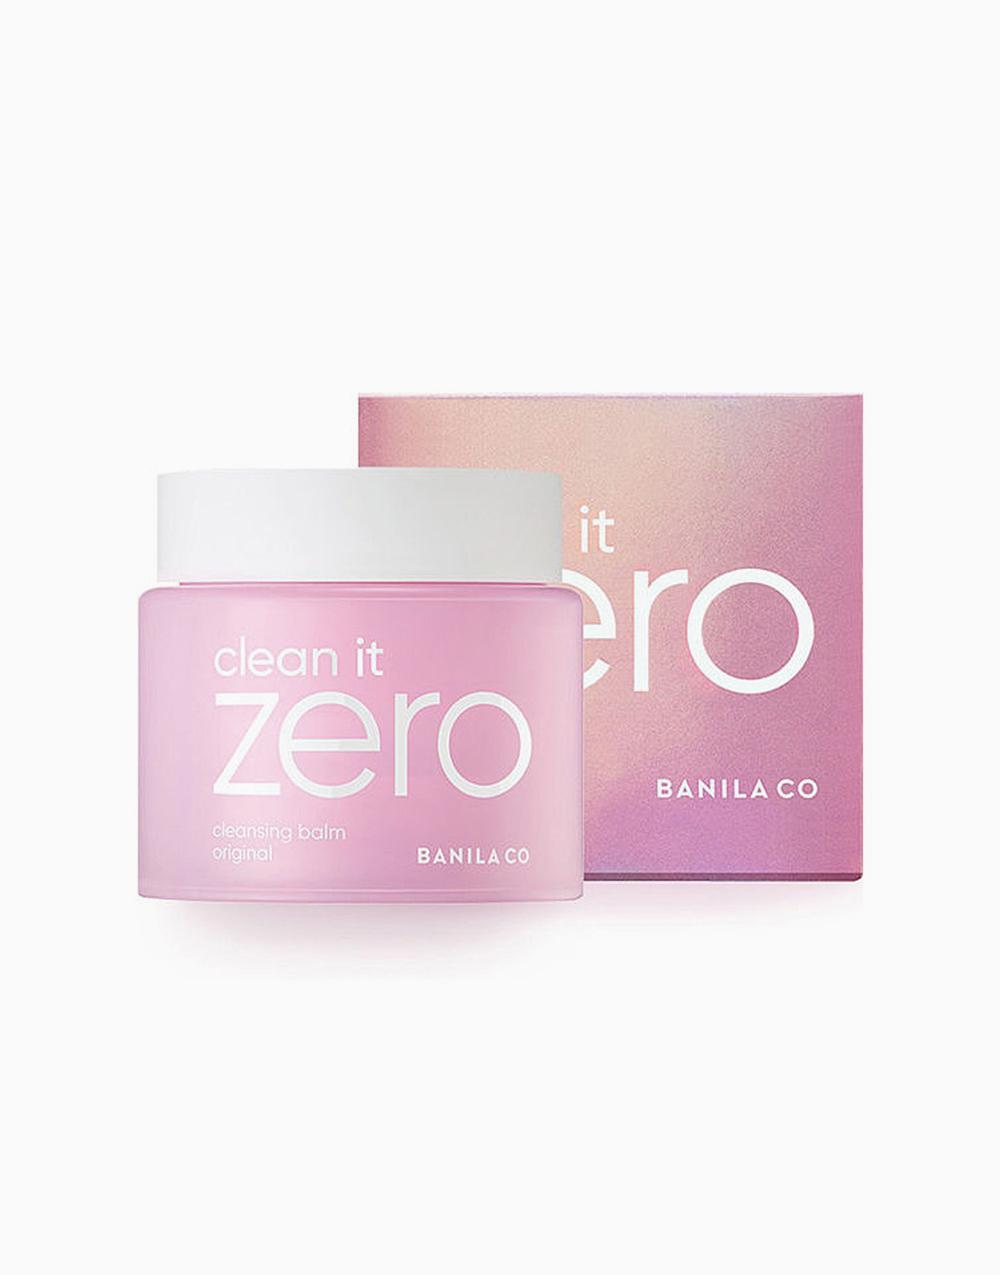 Clean It Zero Travel Size (50ml) by Banila Co.